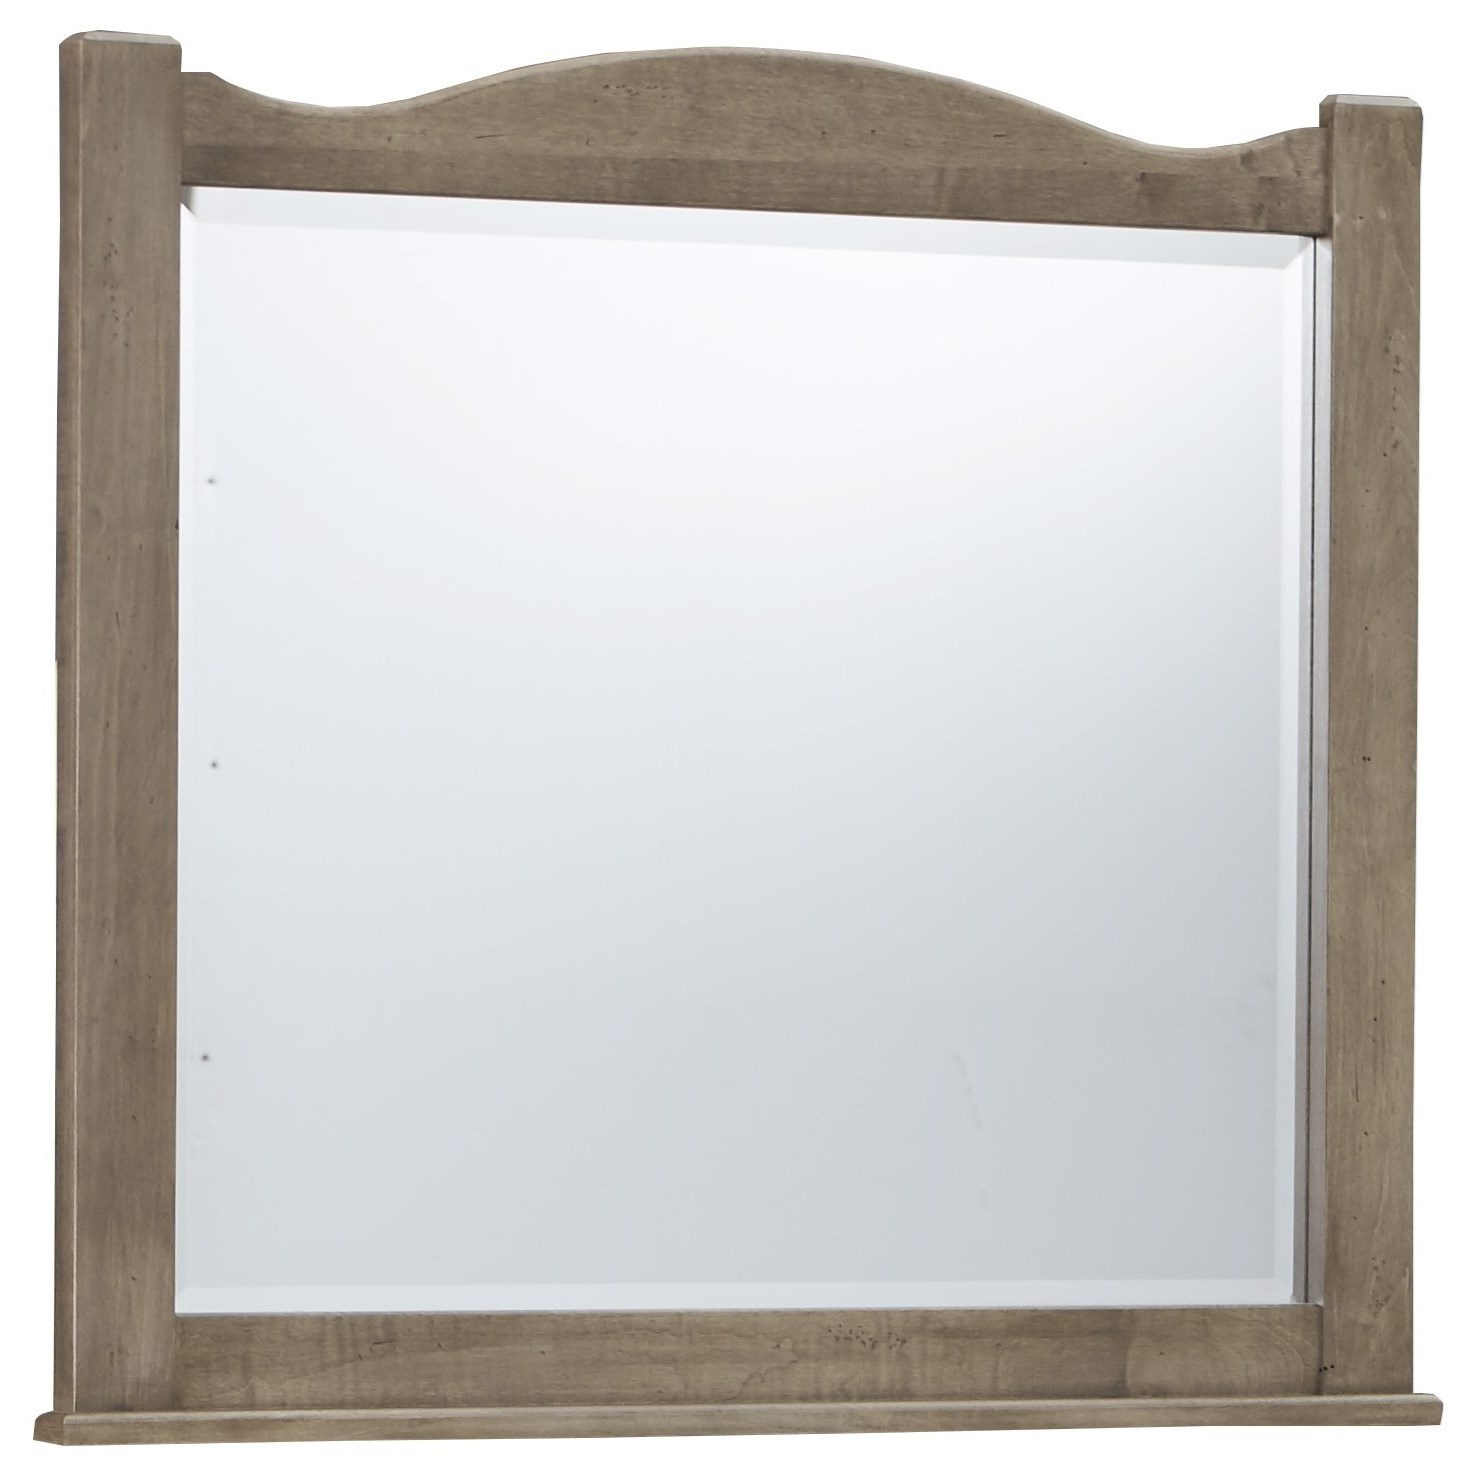 Vaughan Bassett American Maple Landscape Mirror - Beveled Glass - Item Number: 401-446